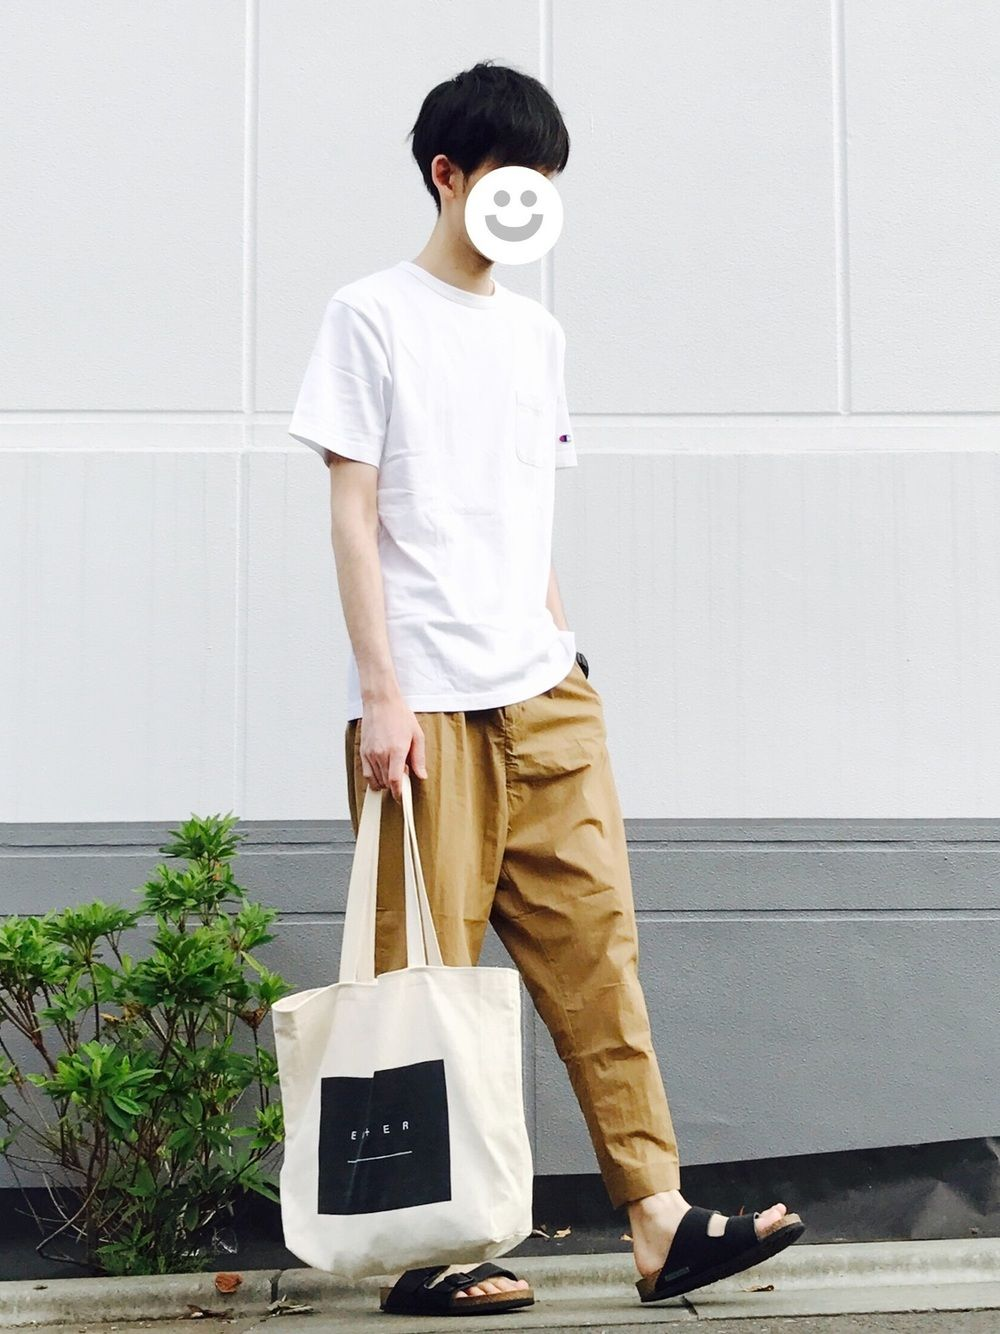 oversized chino, birkenstock(画像あり) ヨーロッパカジュアル, メンズファッション